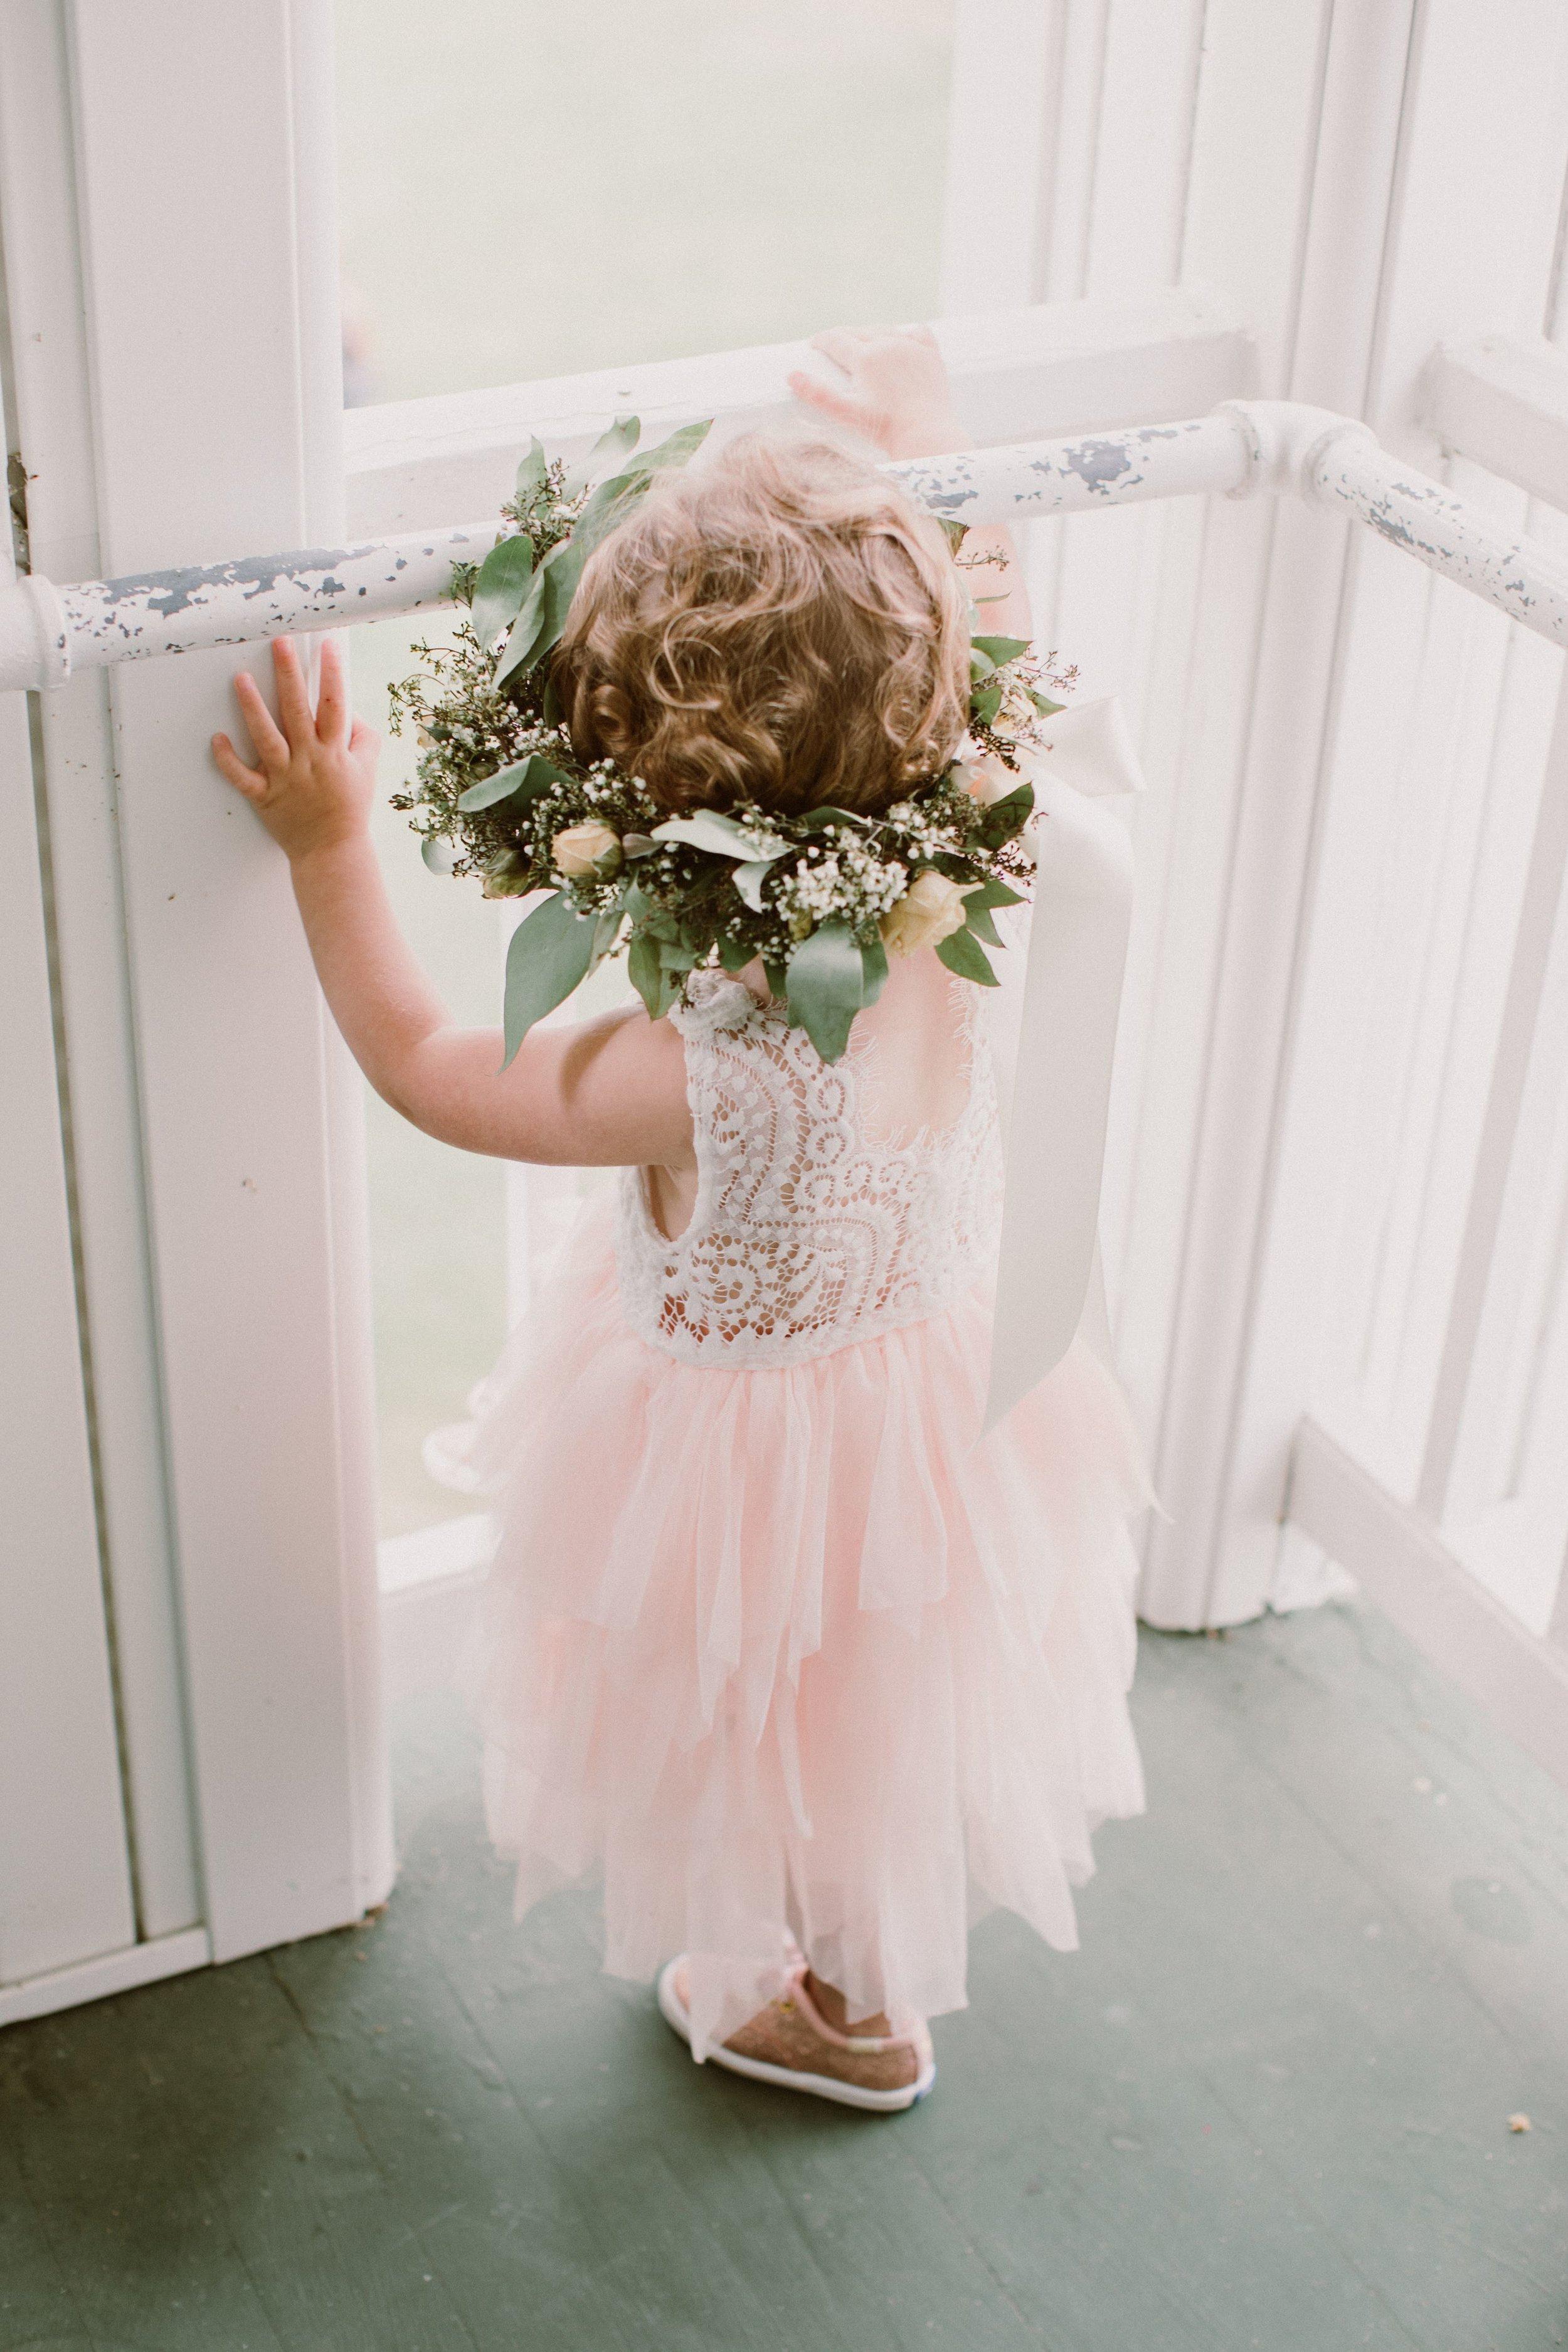 Amber's daughter, Quinn, was the flower girl!